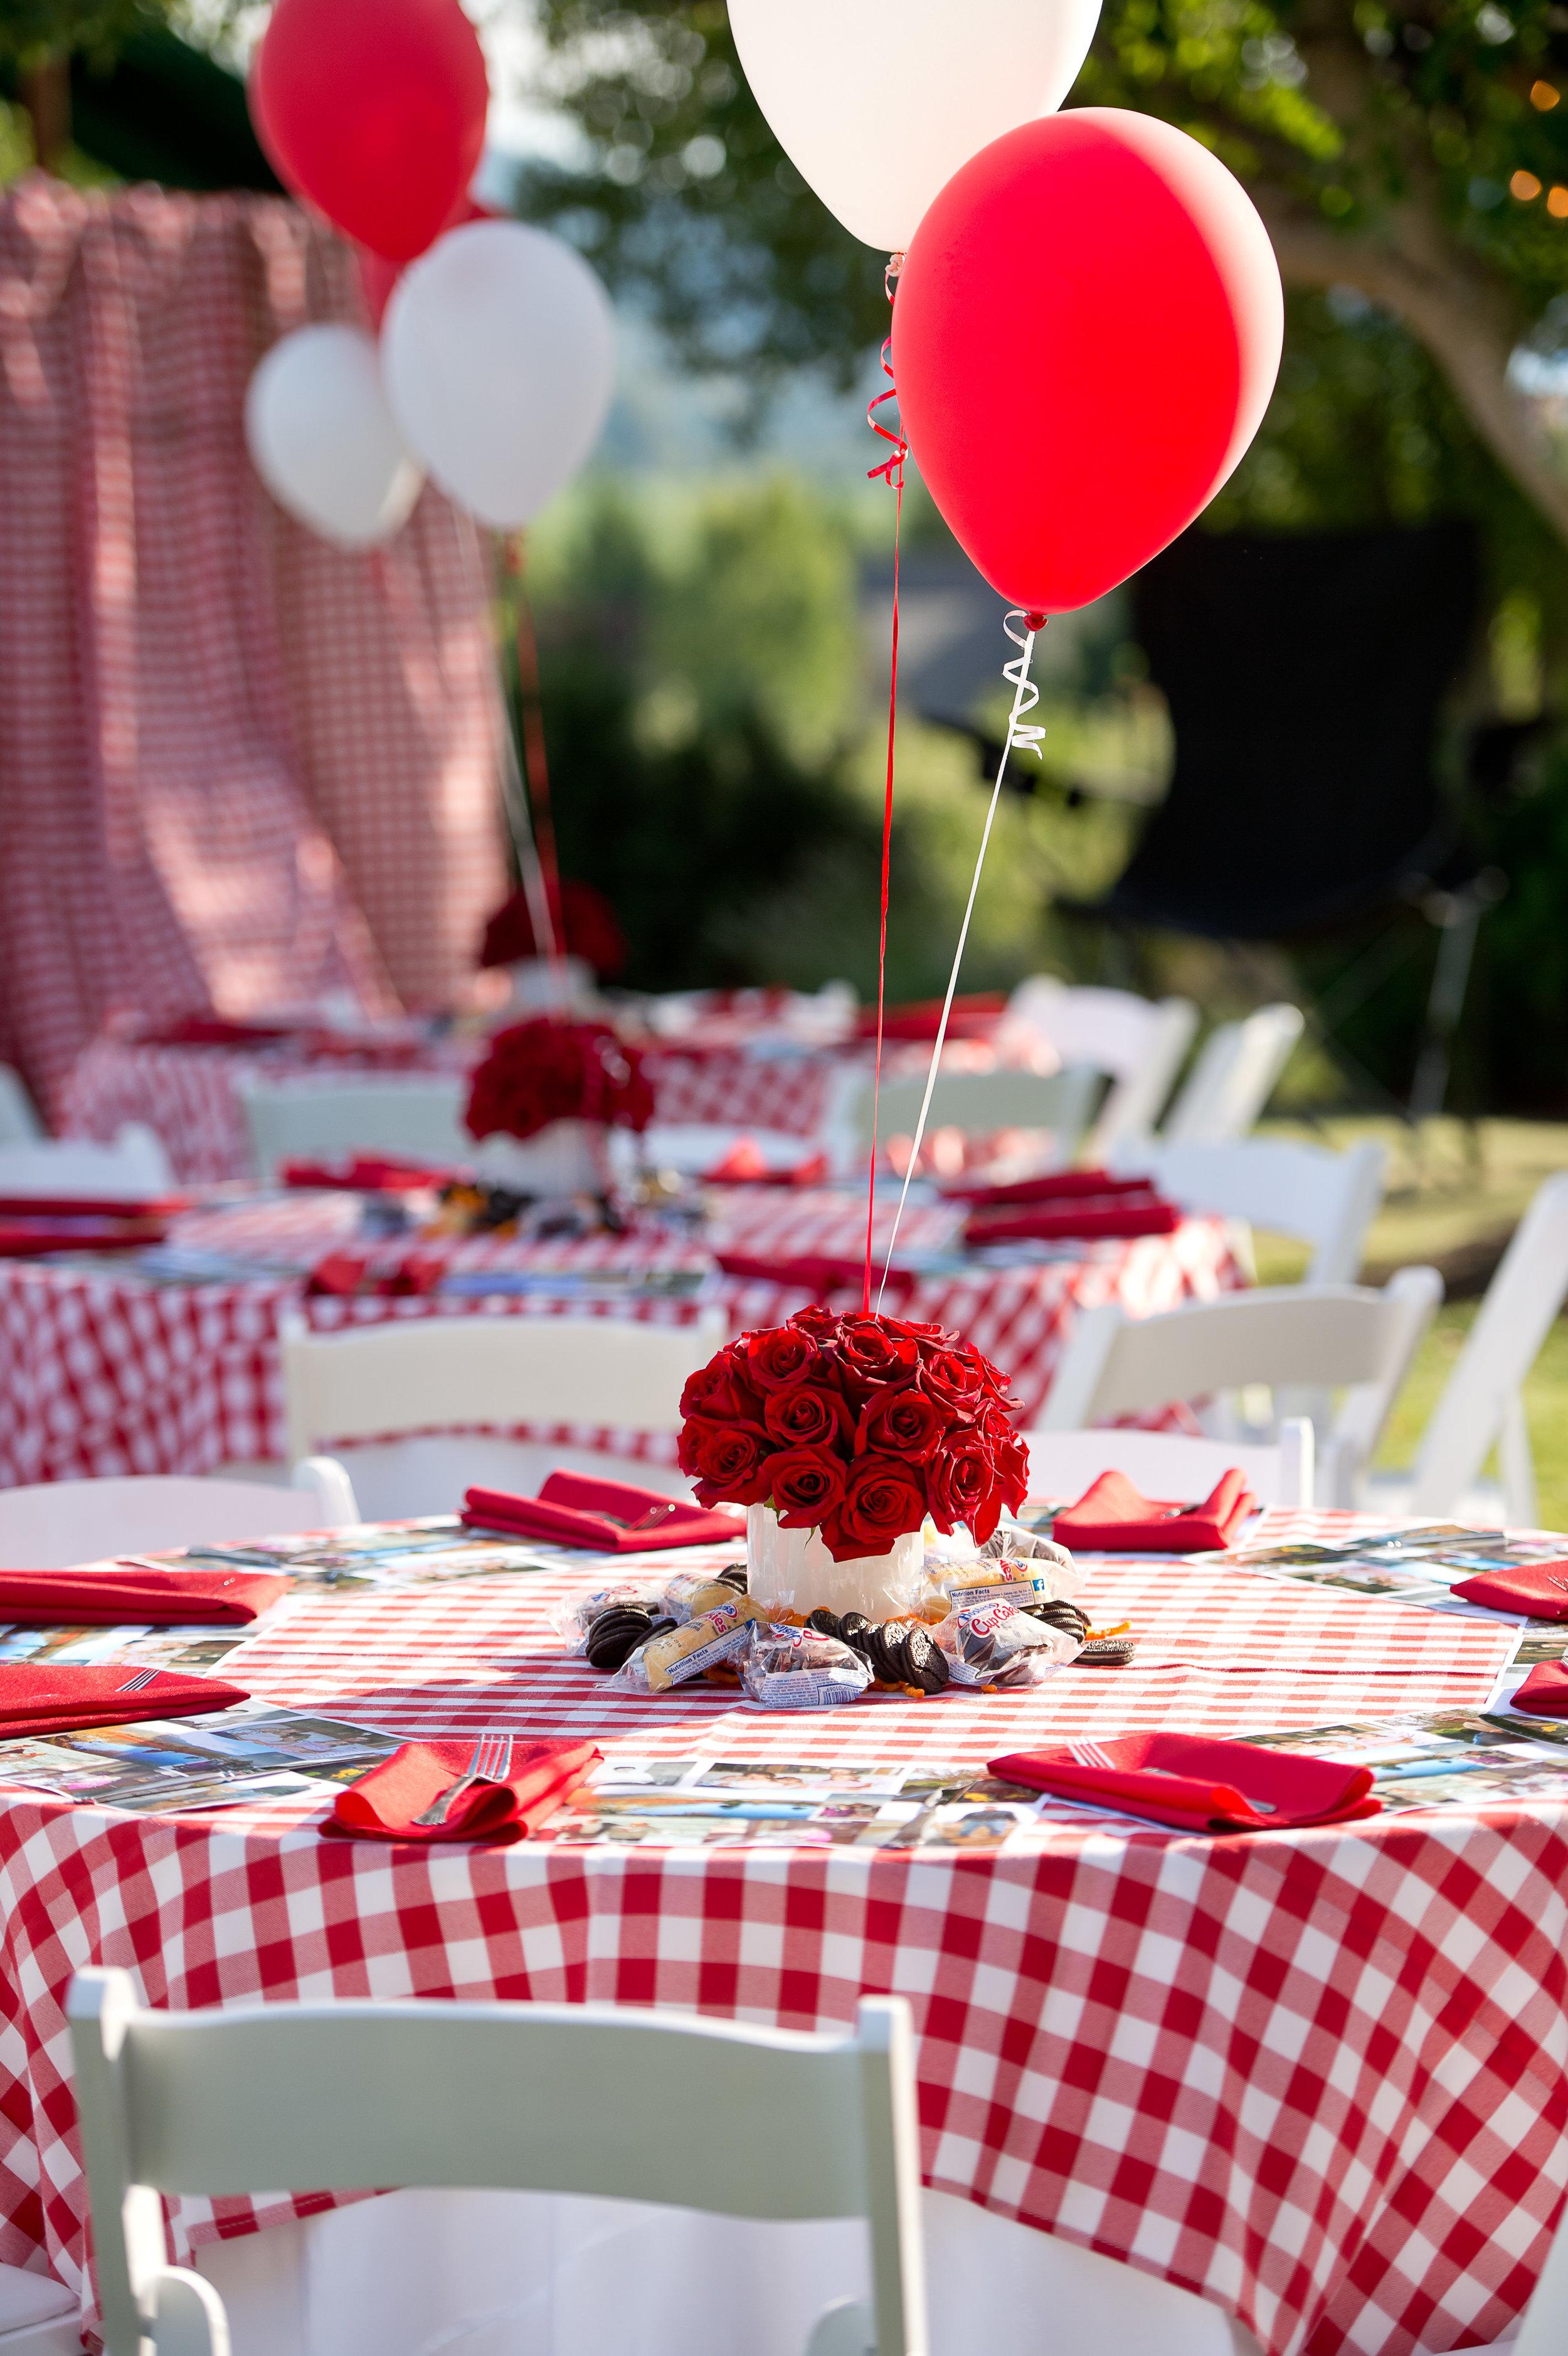 00045-moscastudio-70th-birthday-party-roseburg-oregon-20160826-PRINT.jpg